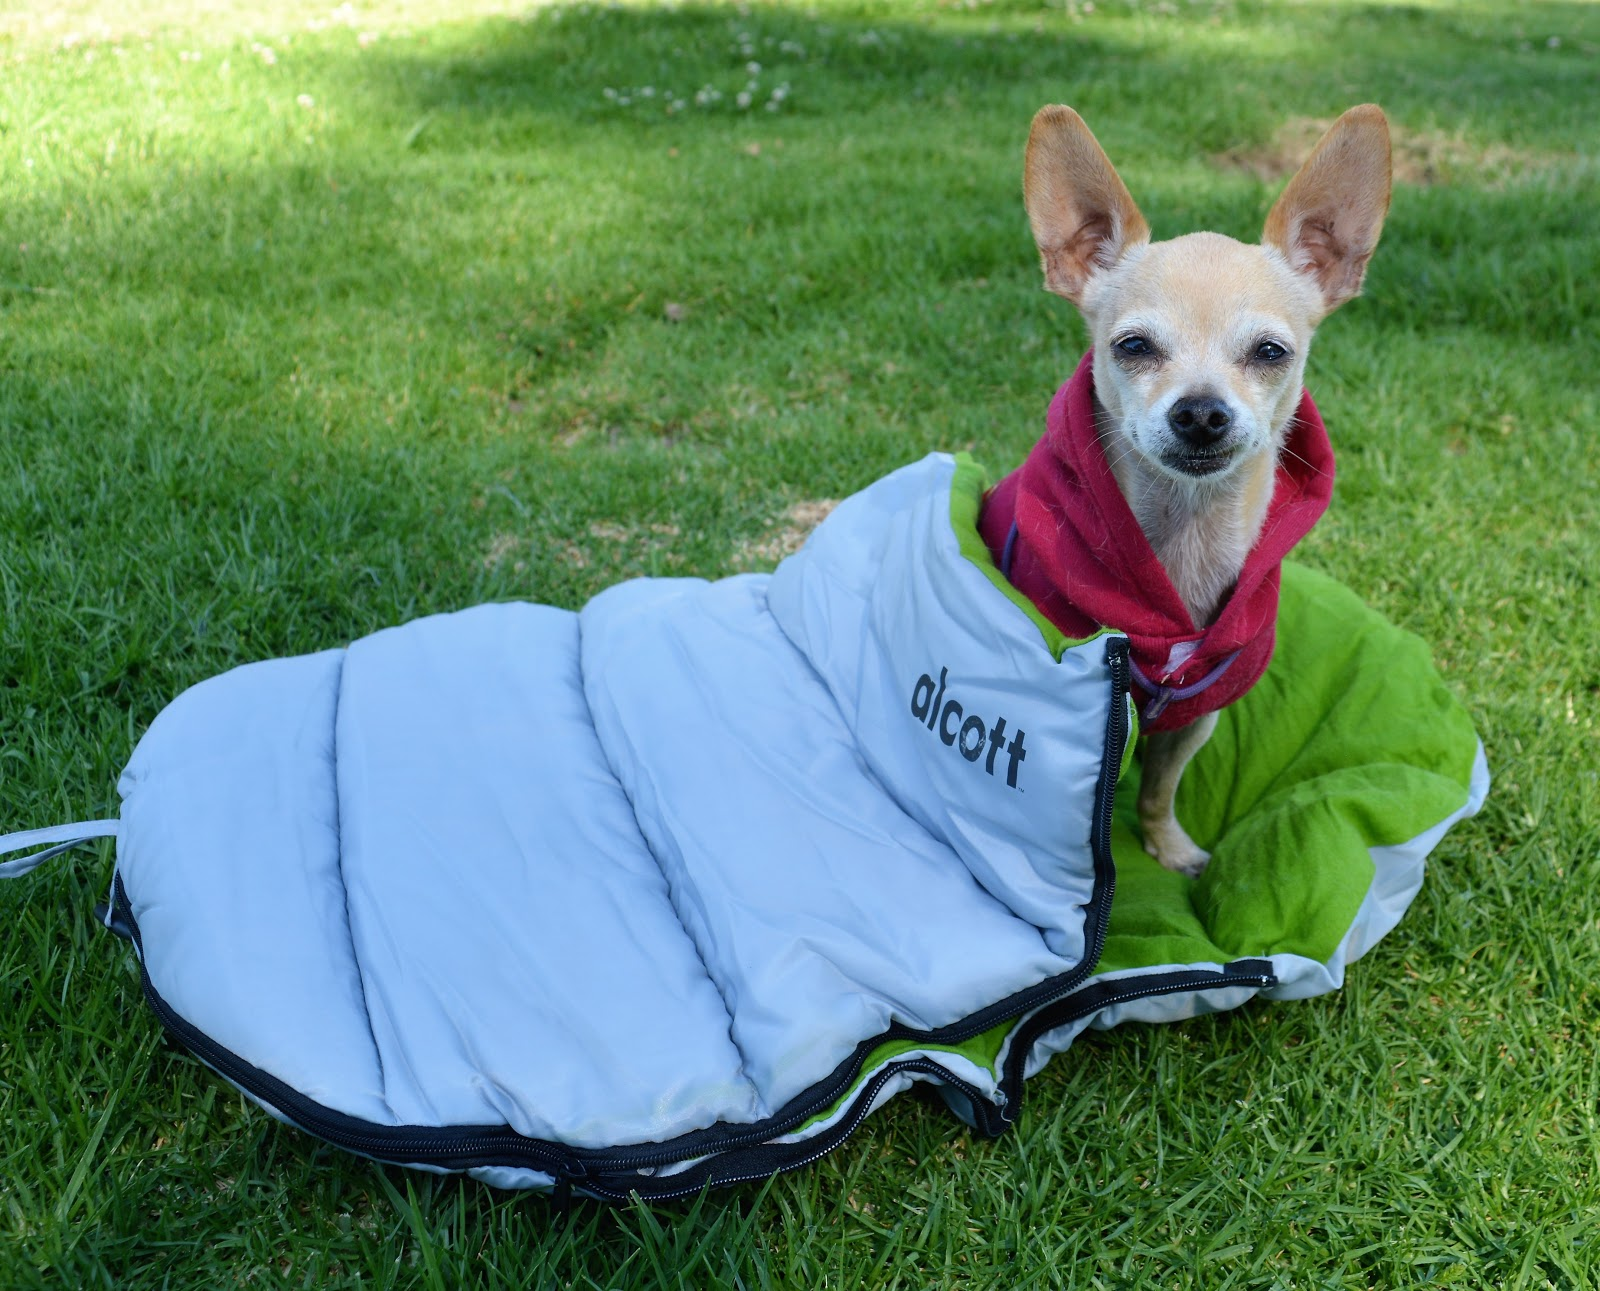 The Dog Geek Product Review Alcott Explorer Sleeping Bag